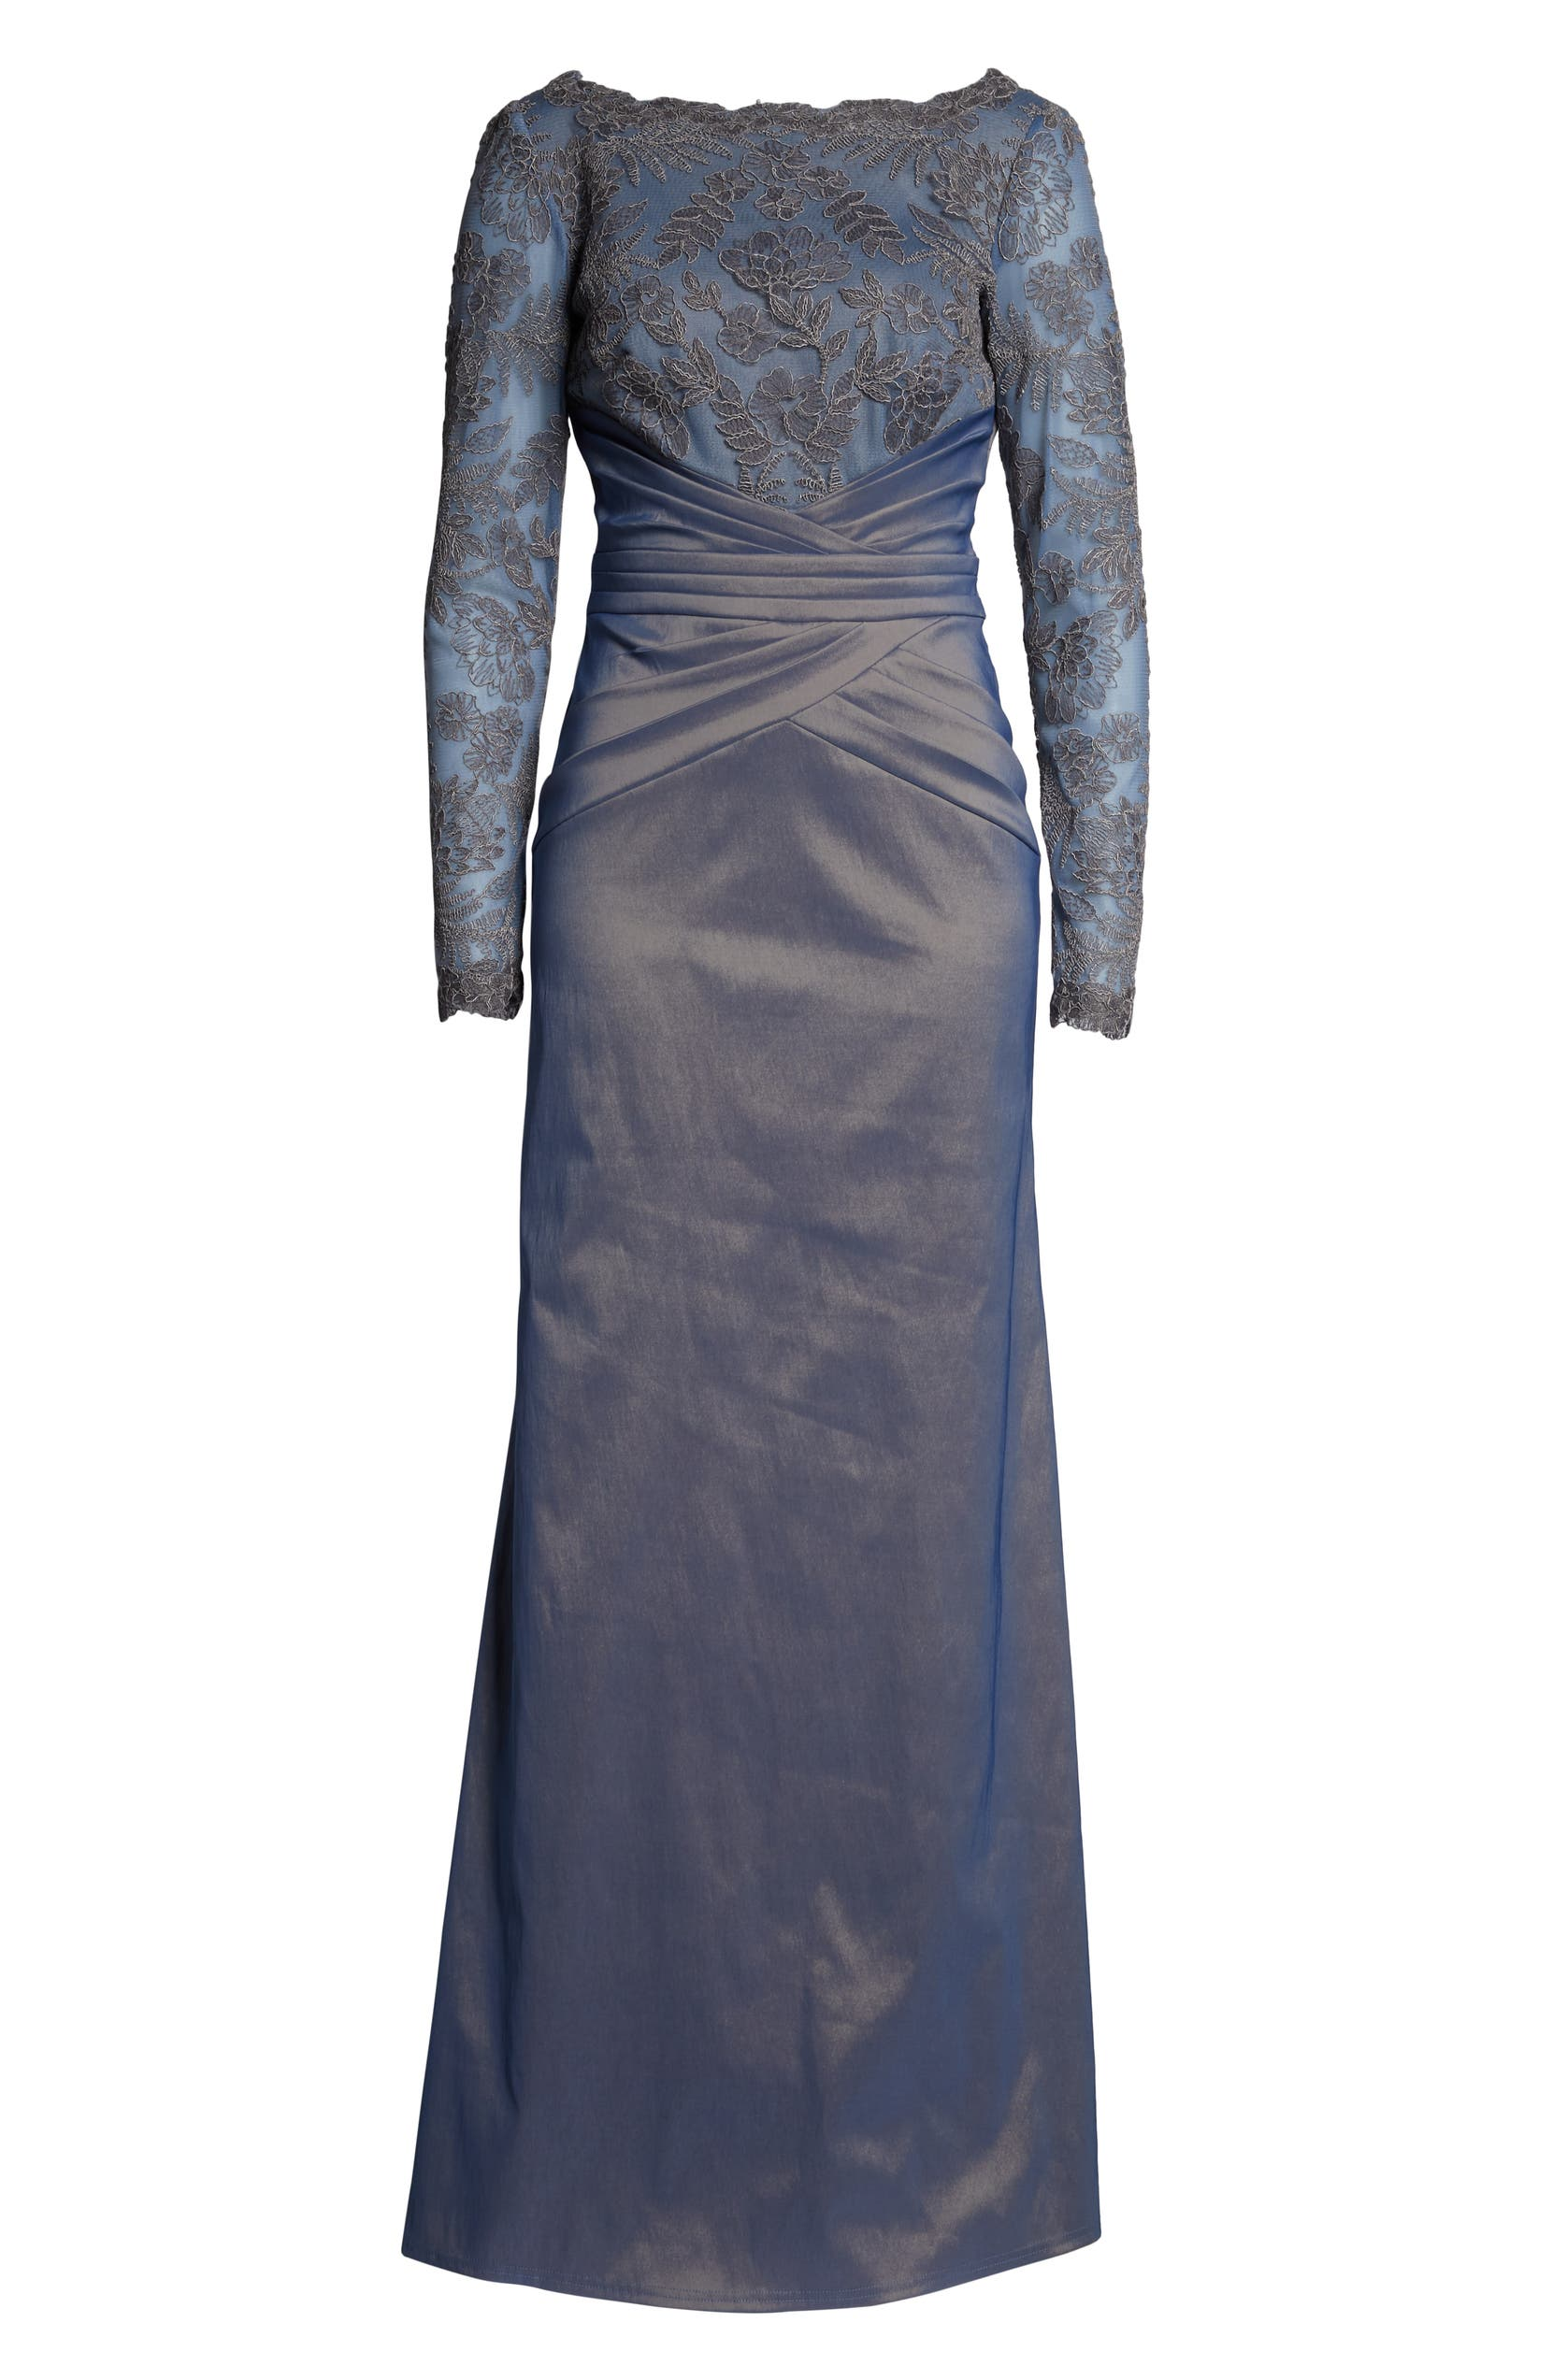 0d493196e217e Tadashi Shoji Embroidered Mesh & Taffeta Gown | Nordstrom